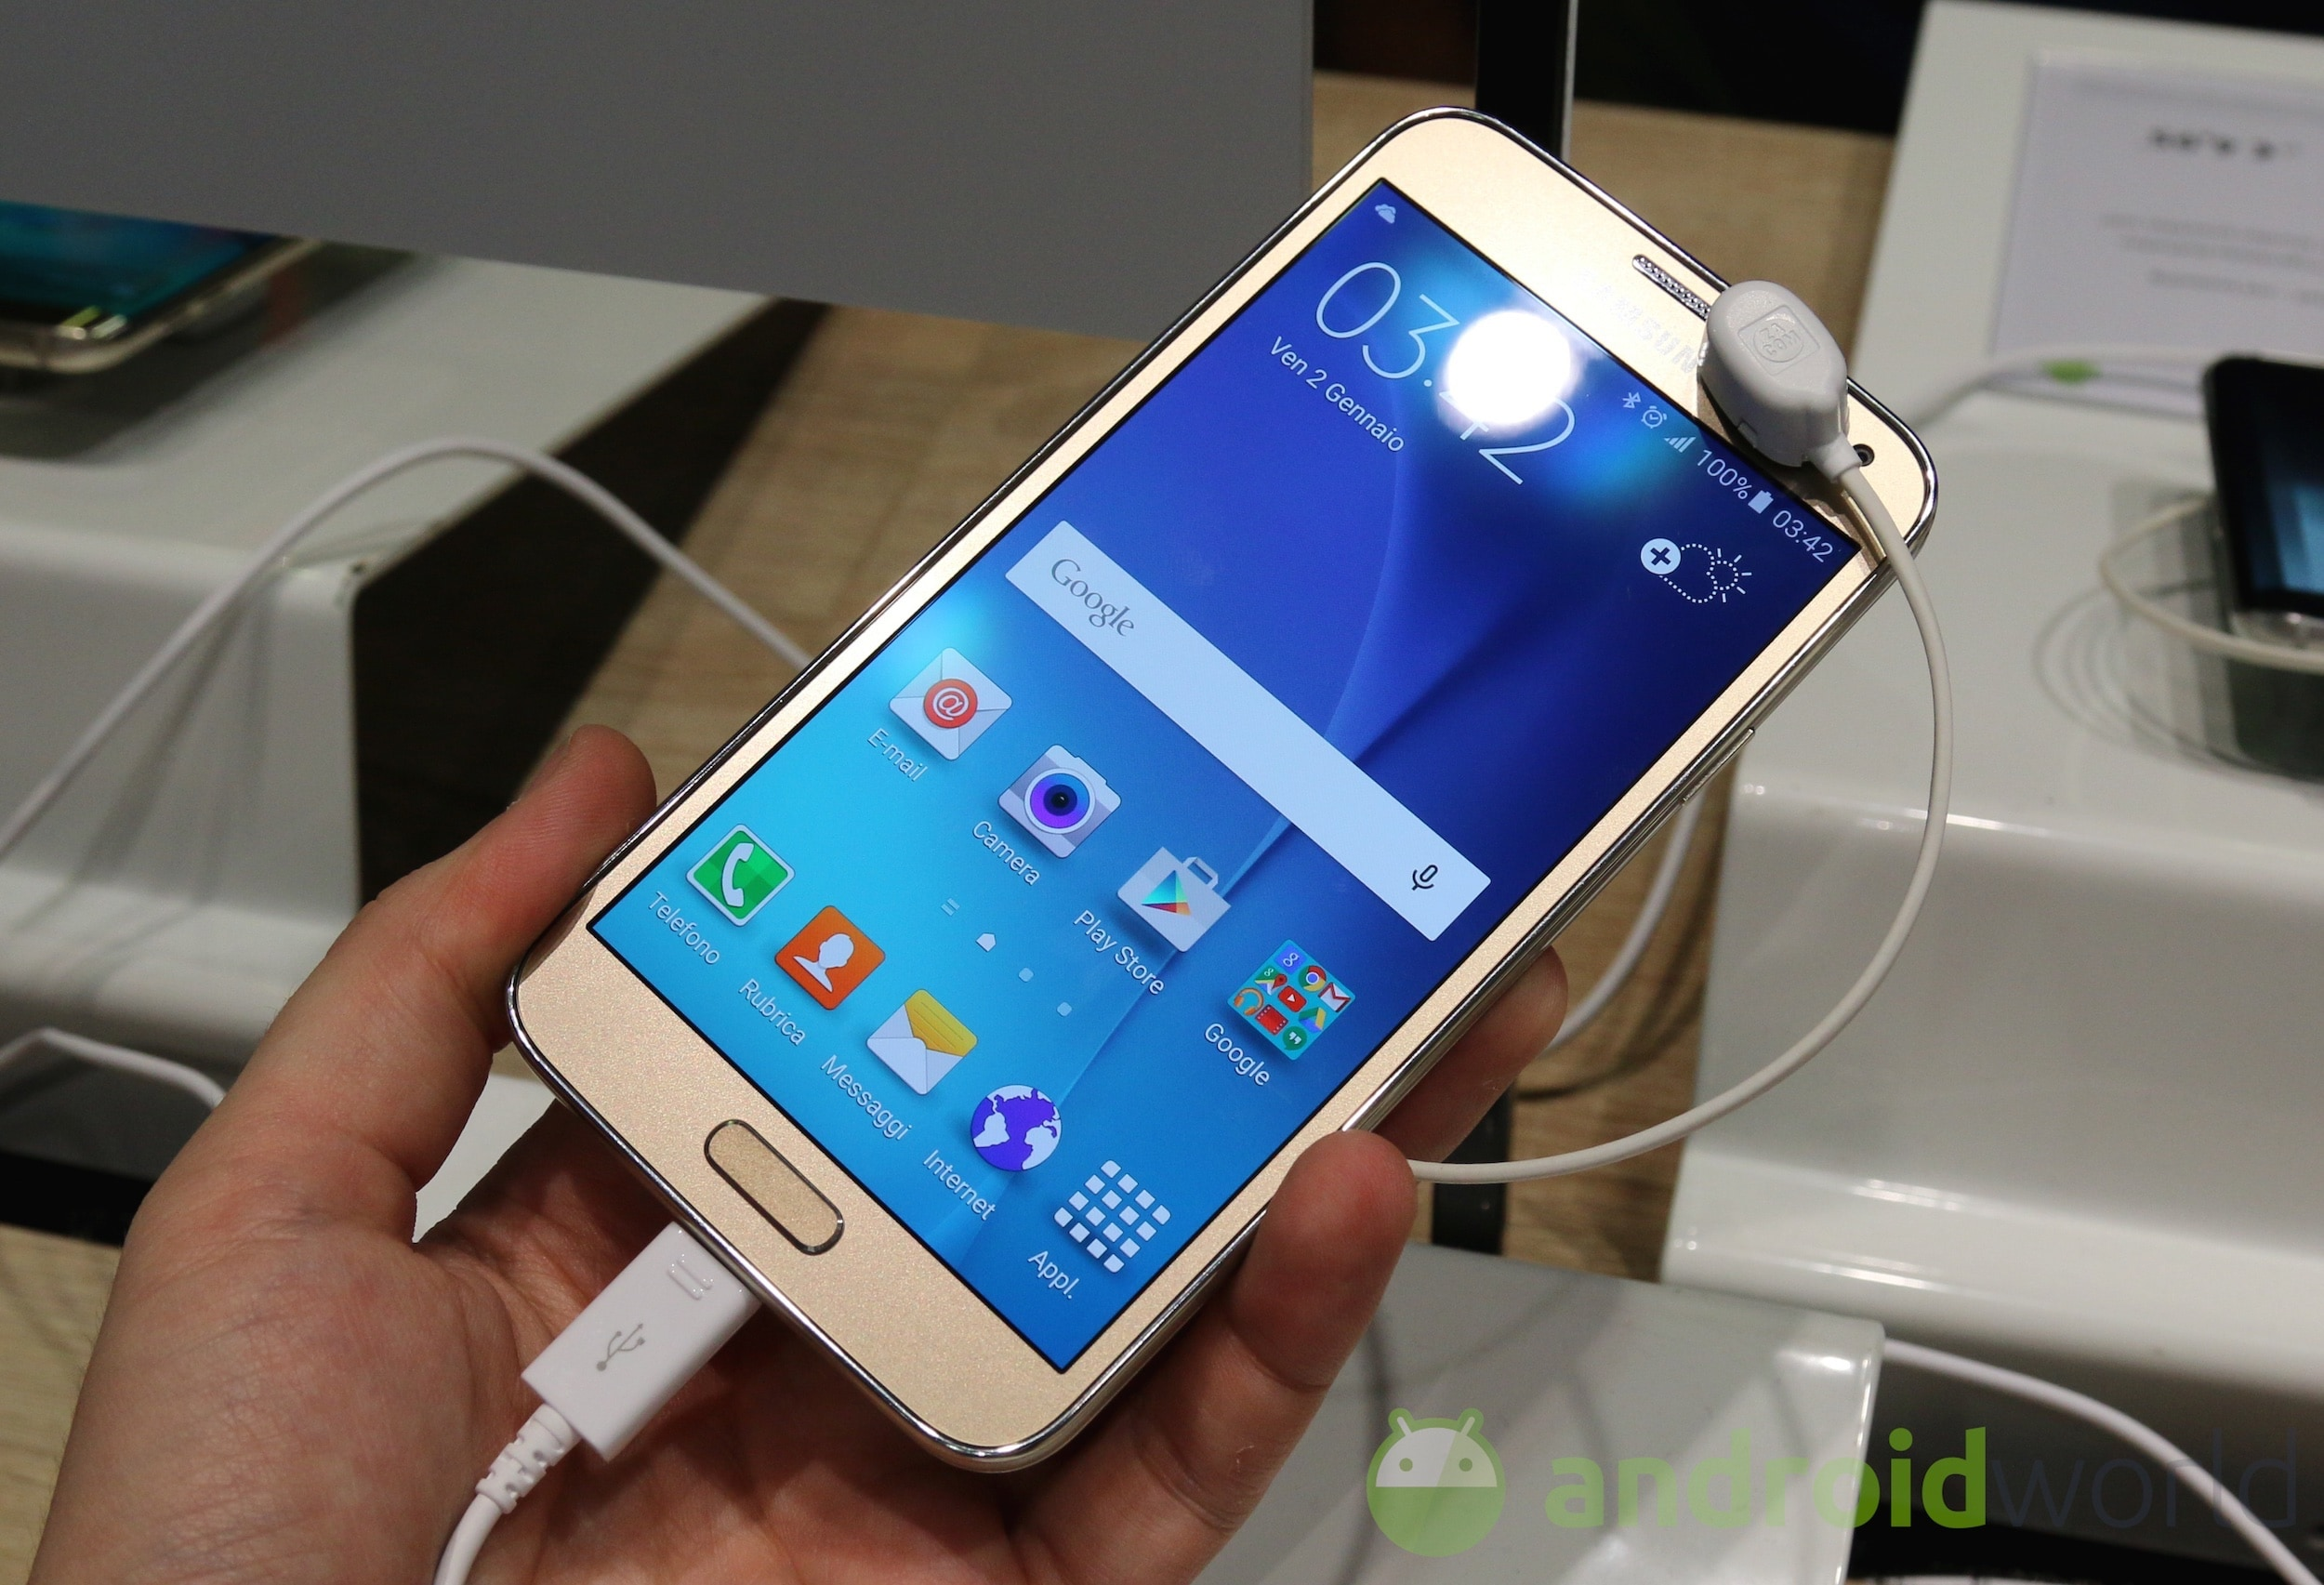 Samsung Galaxy S5 Neo Anteprima Ifa 2015 332724